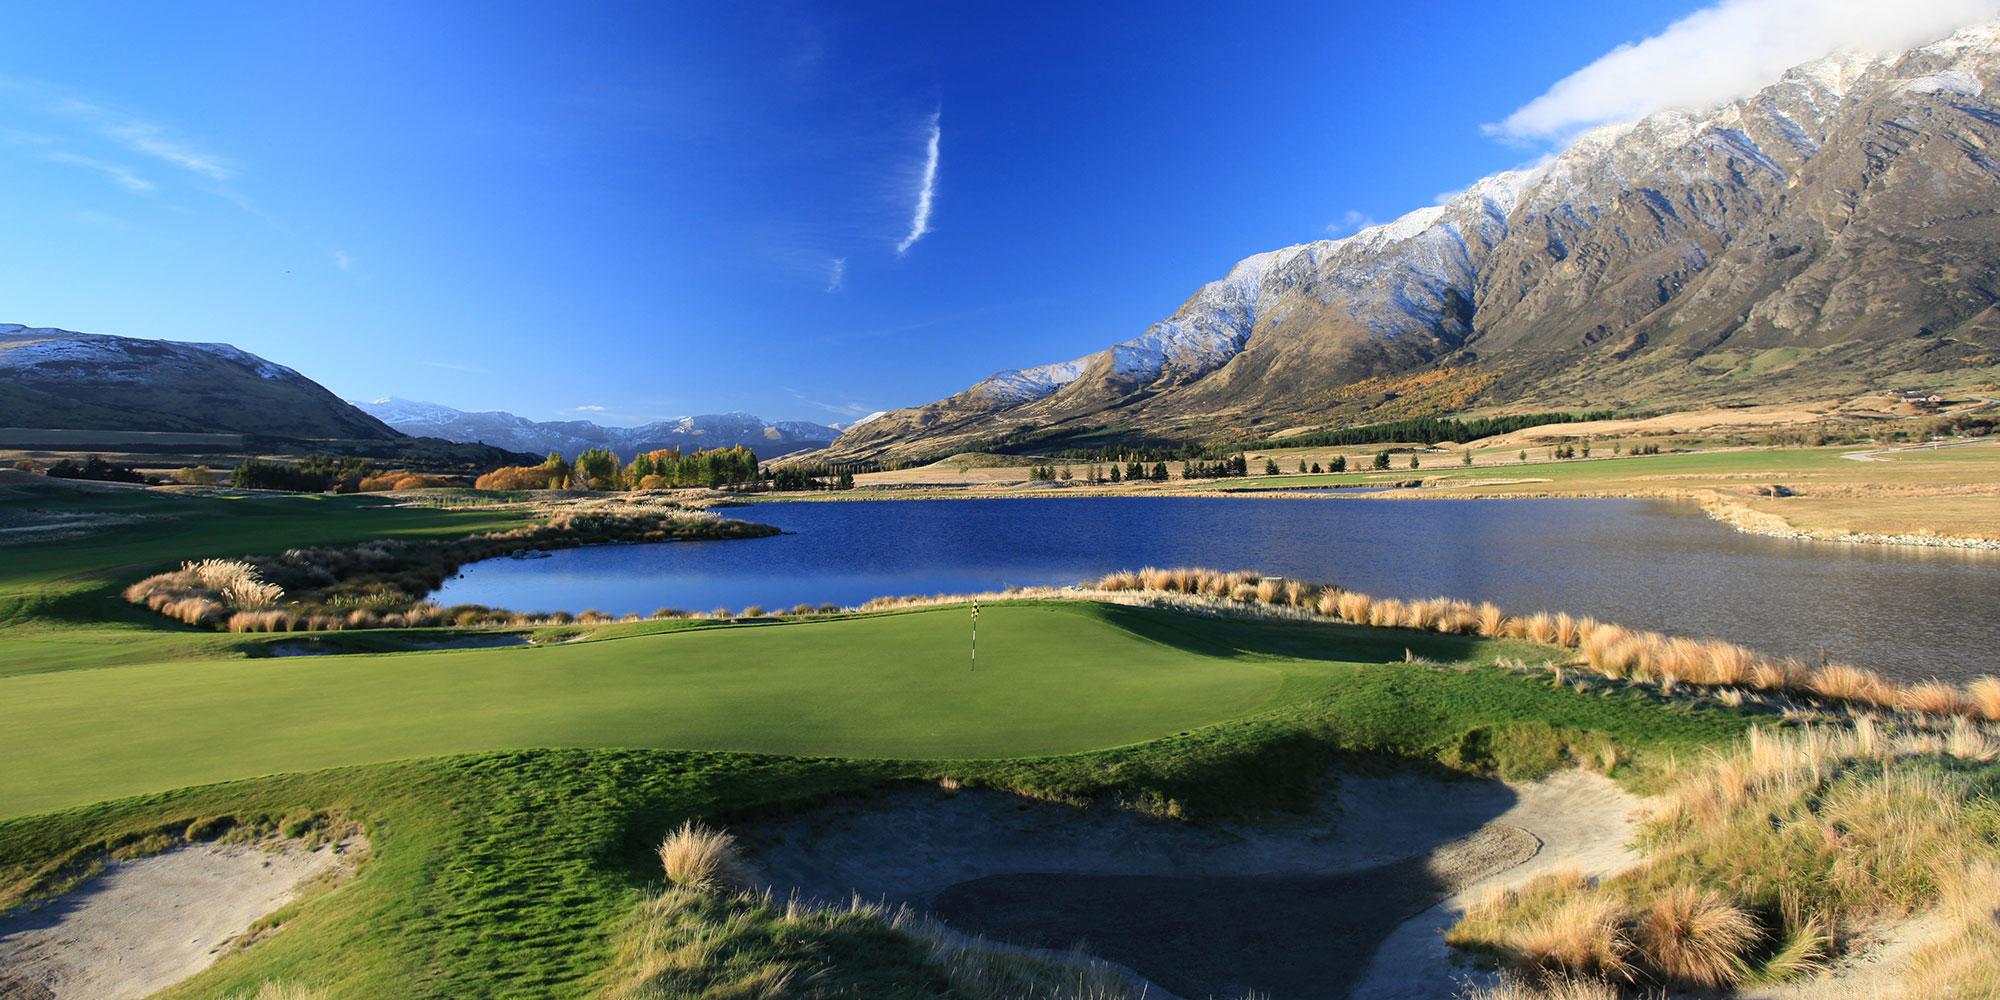 Queenstown, NZ | 6 nights, 5 games